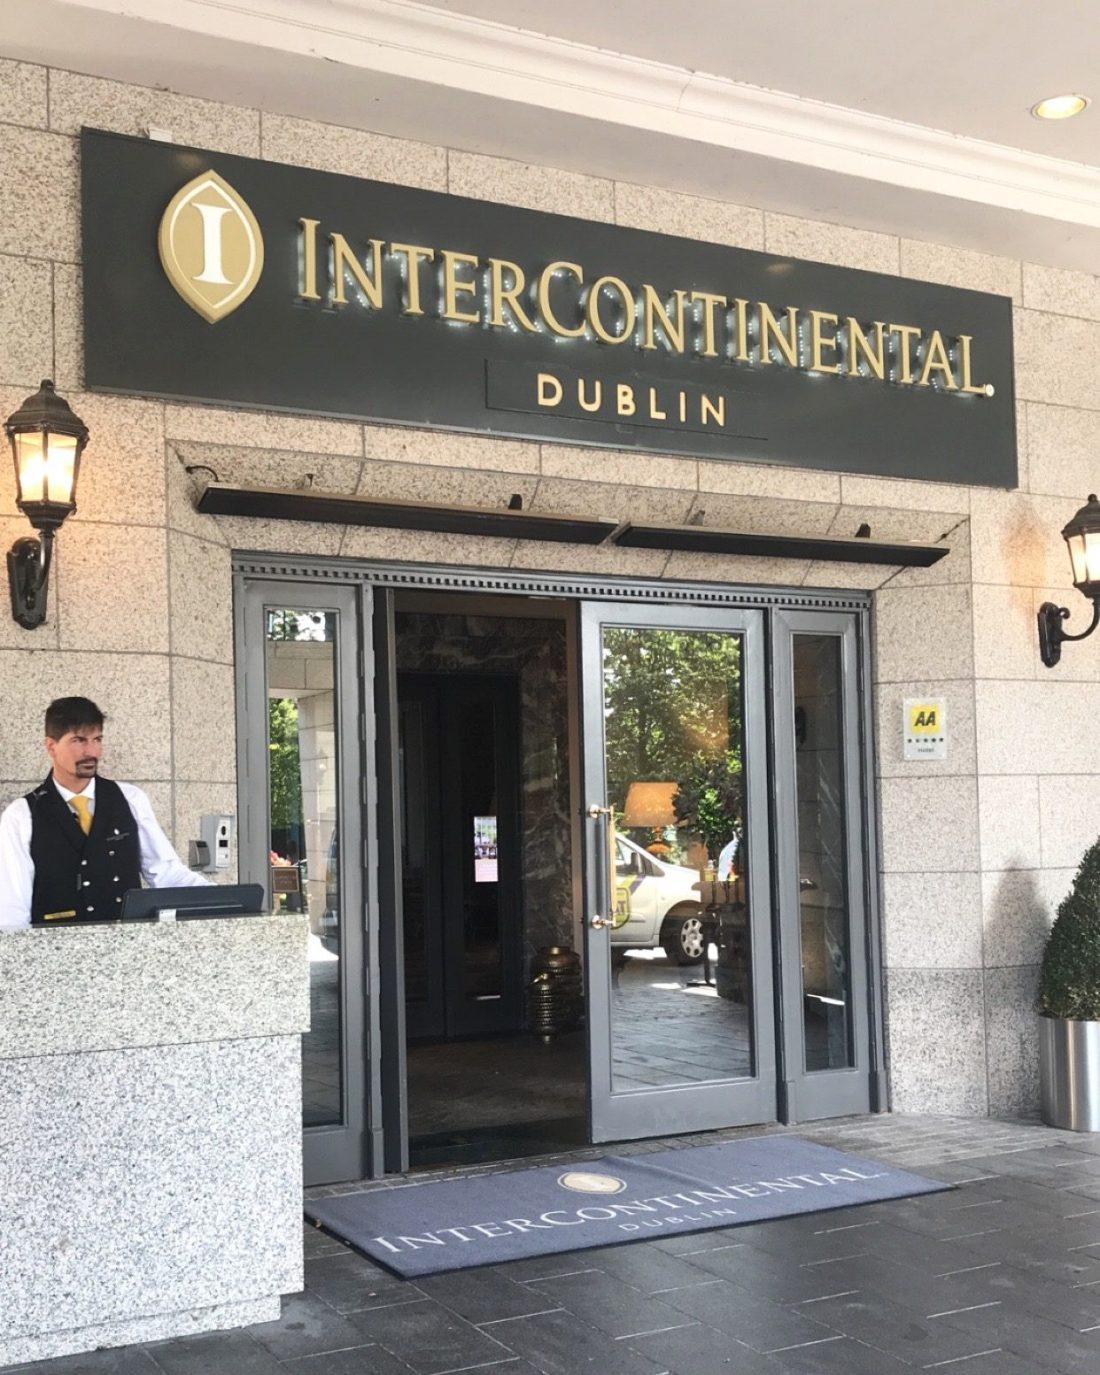 InterContinental Dublin Hotel Review, Nishi V, www.nishiv.com